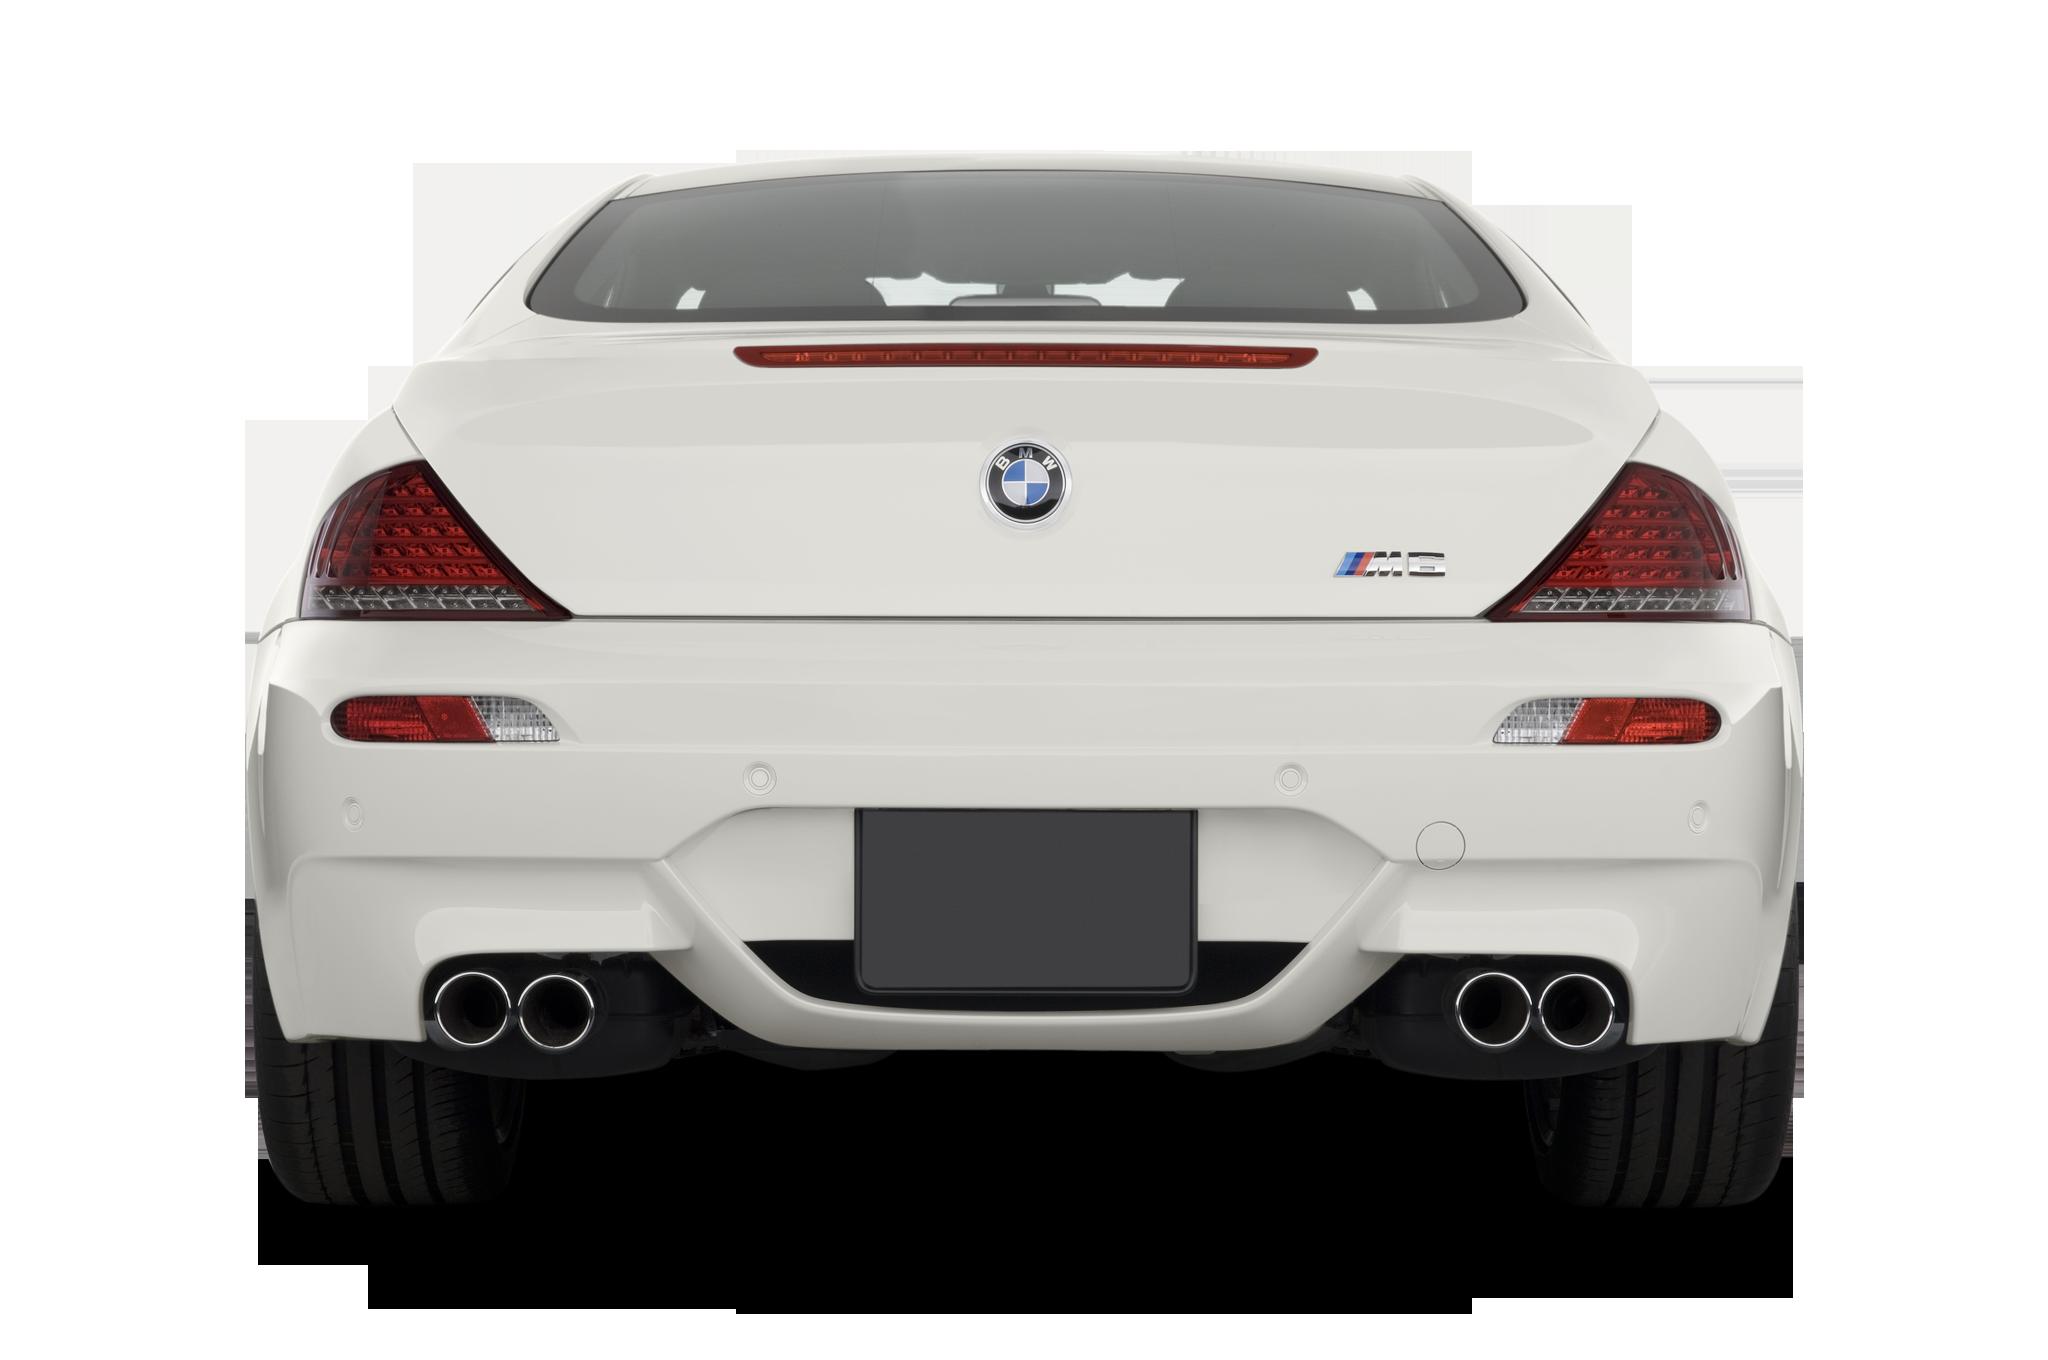 2010 m6 exhaust